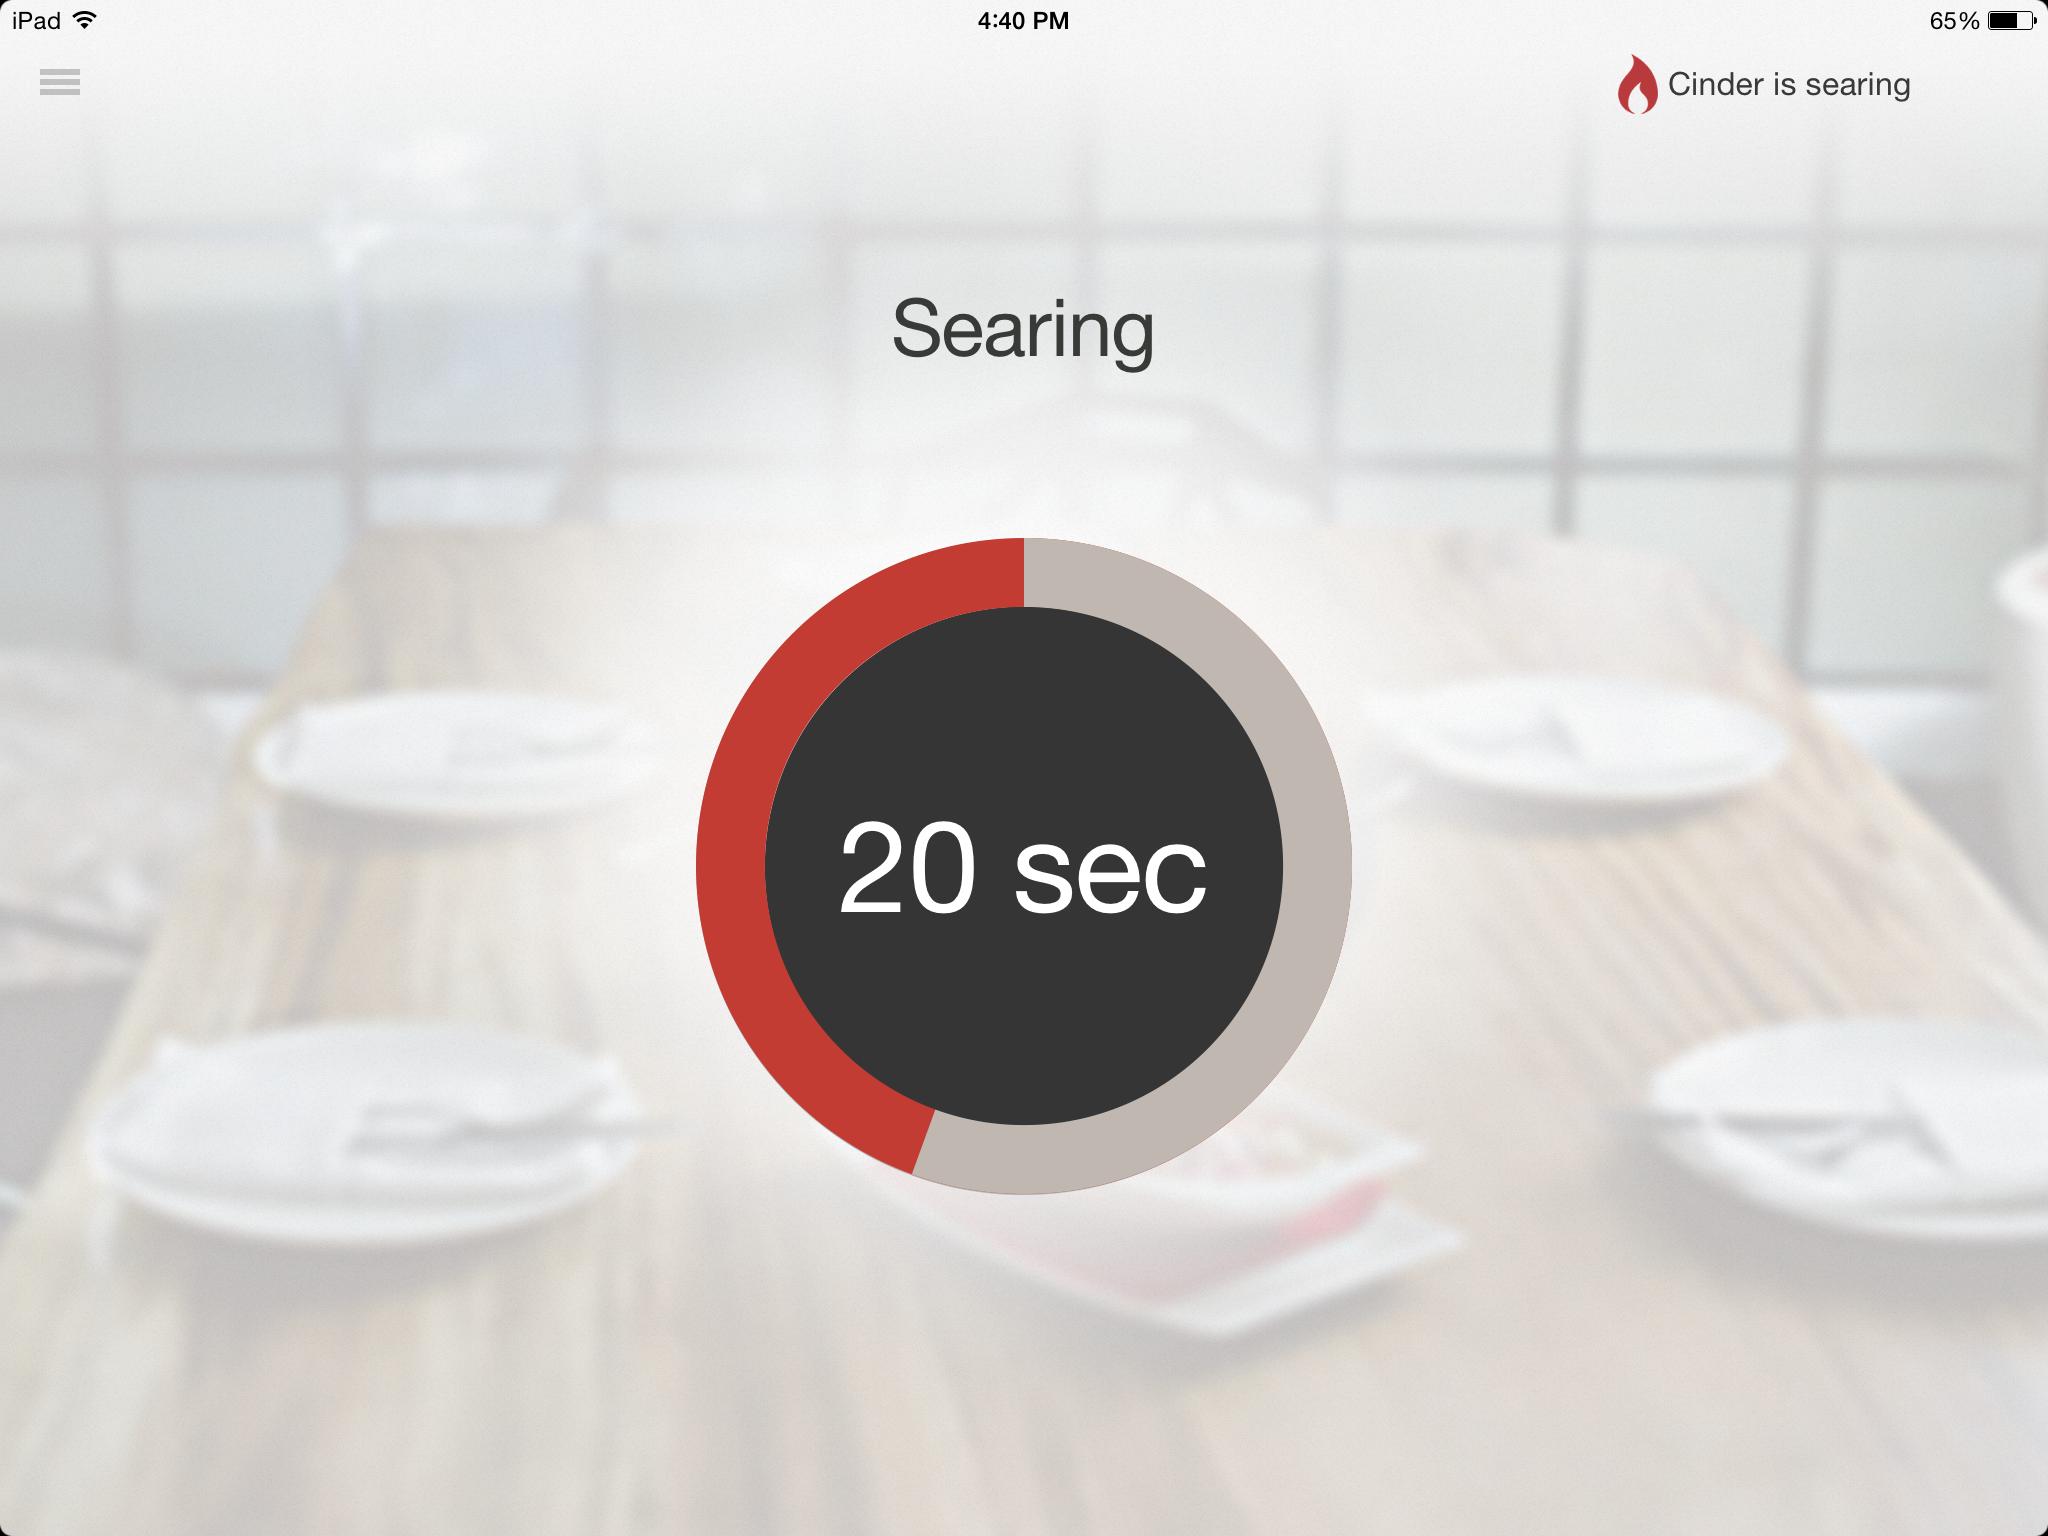 Cinder App-Searing